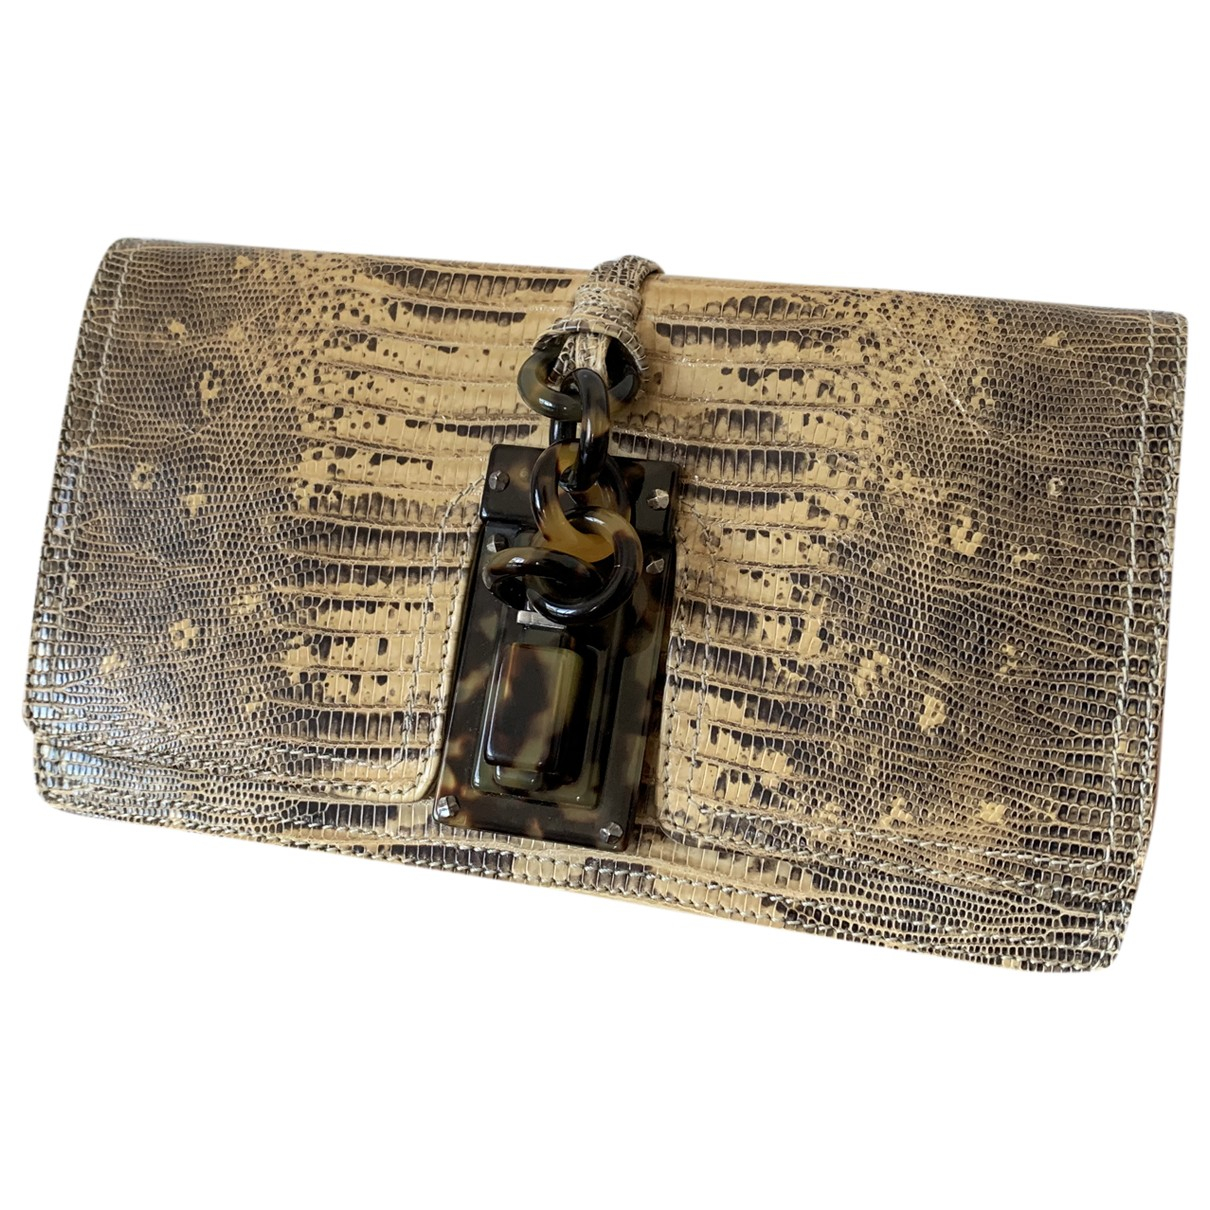 Bottega Veneta \N Brown Python Clutch bag for Women \N